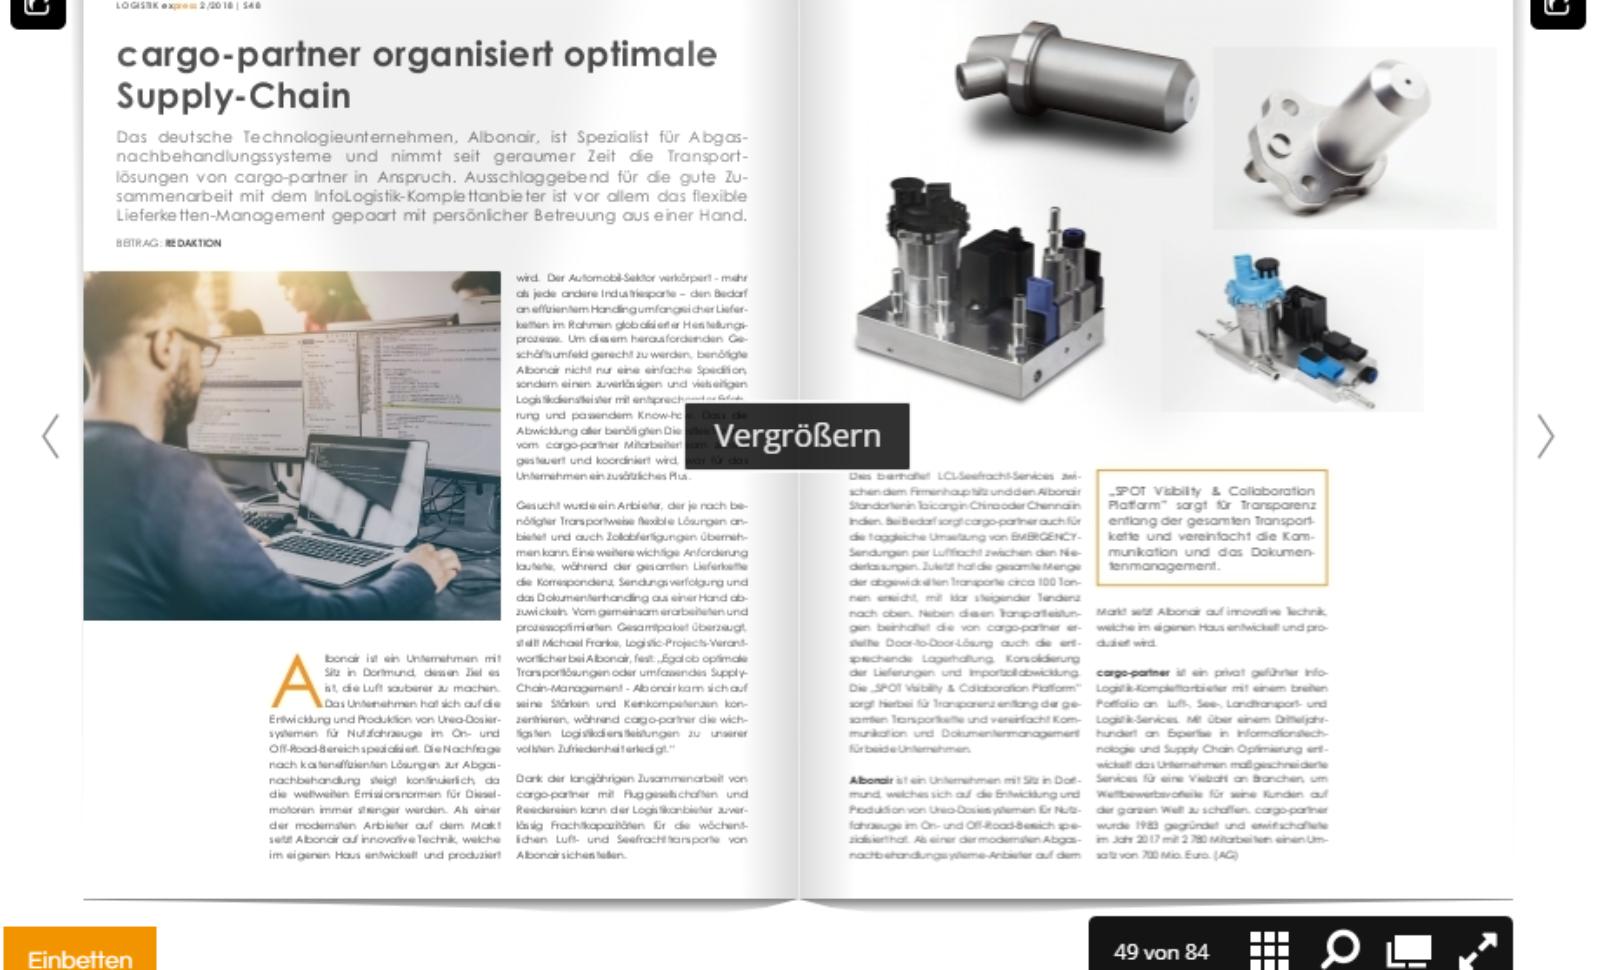 cargo-partner organisiert optimale Supply-Chain